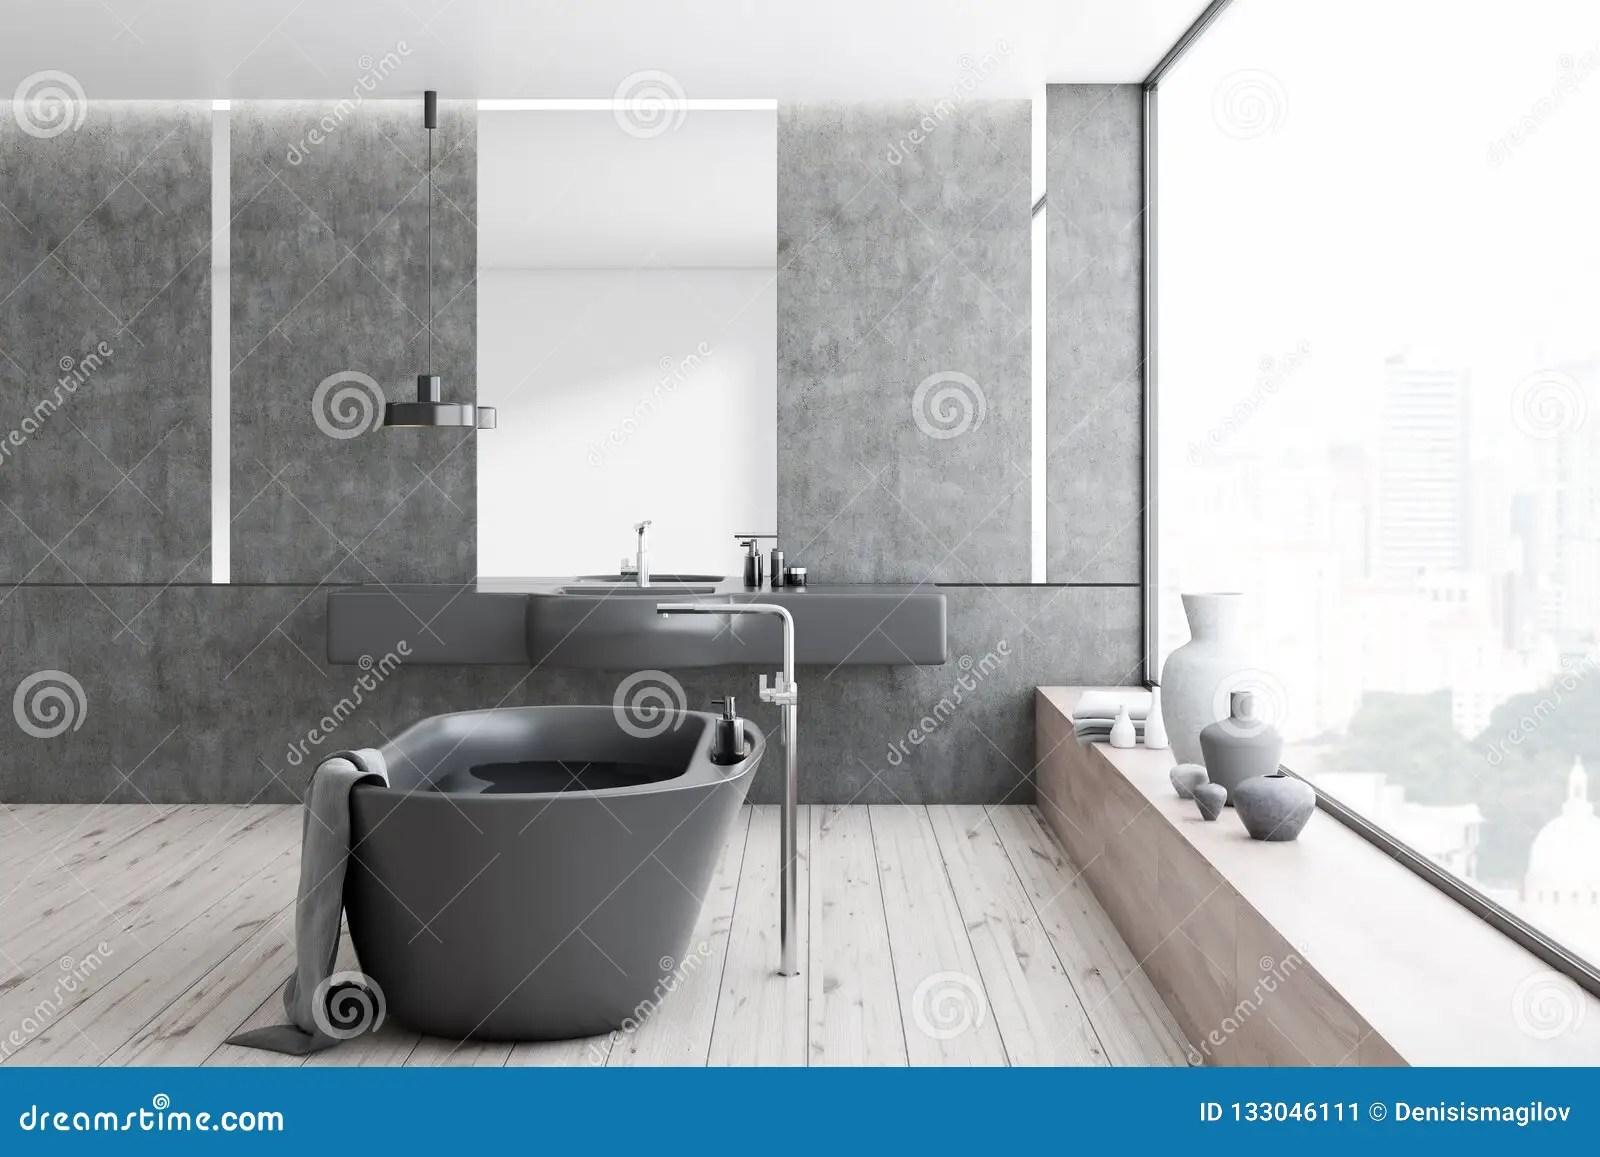 Concrete Bathroom Black Tub And Sink Stock Illustration